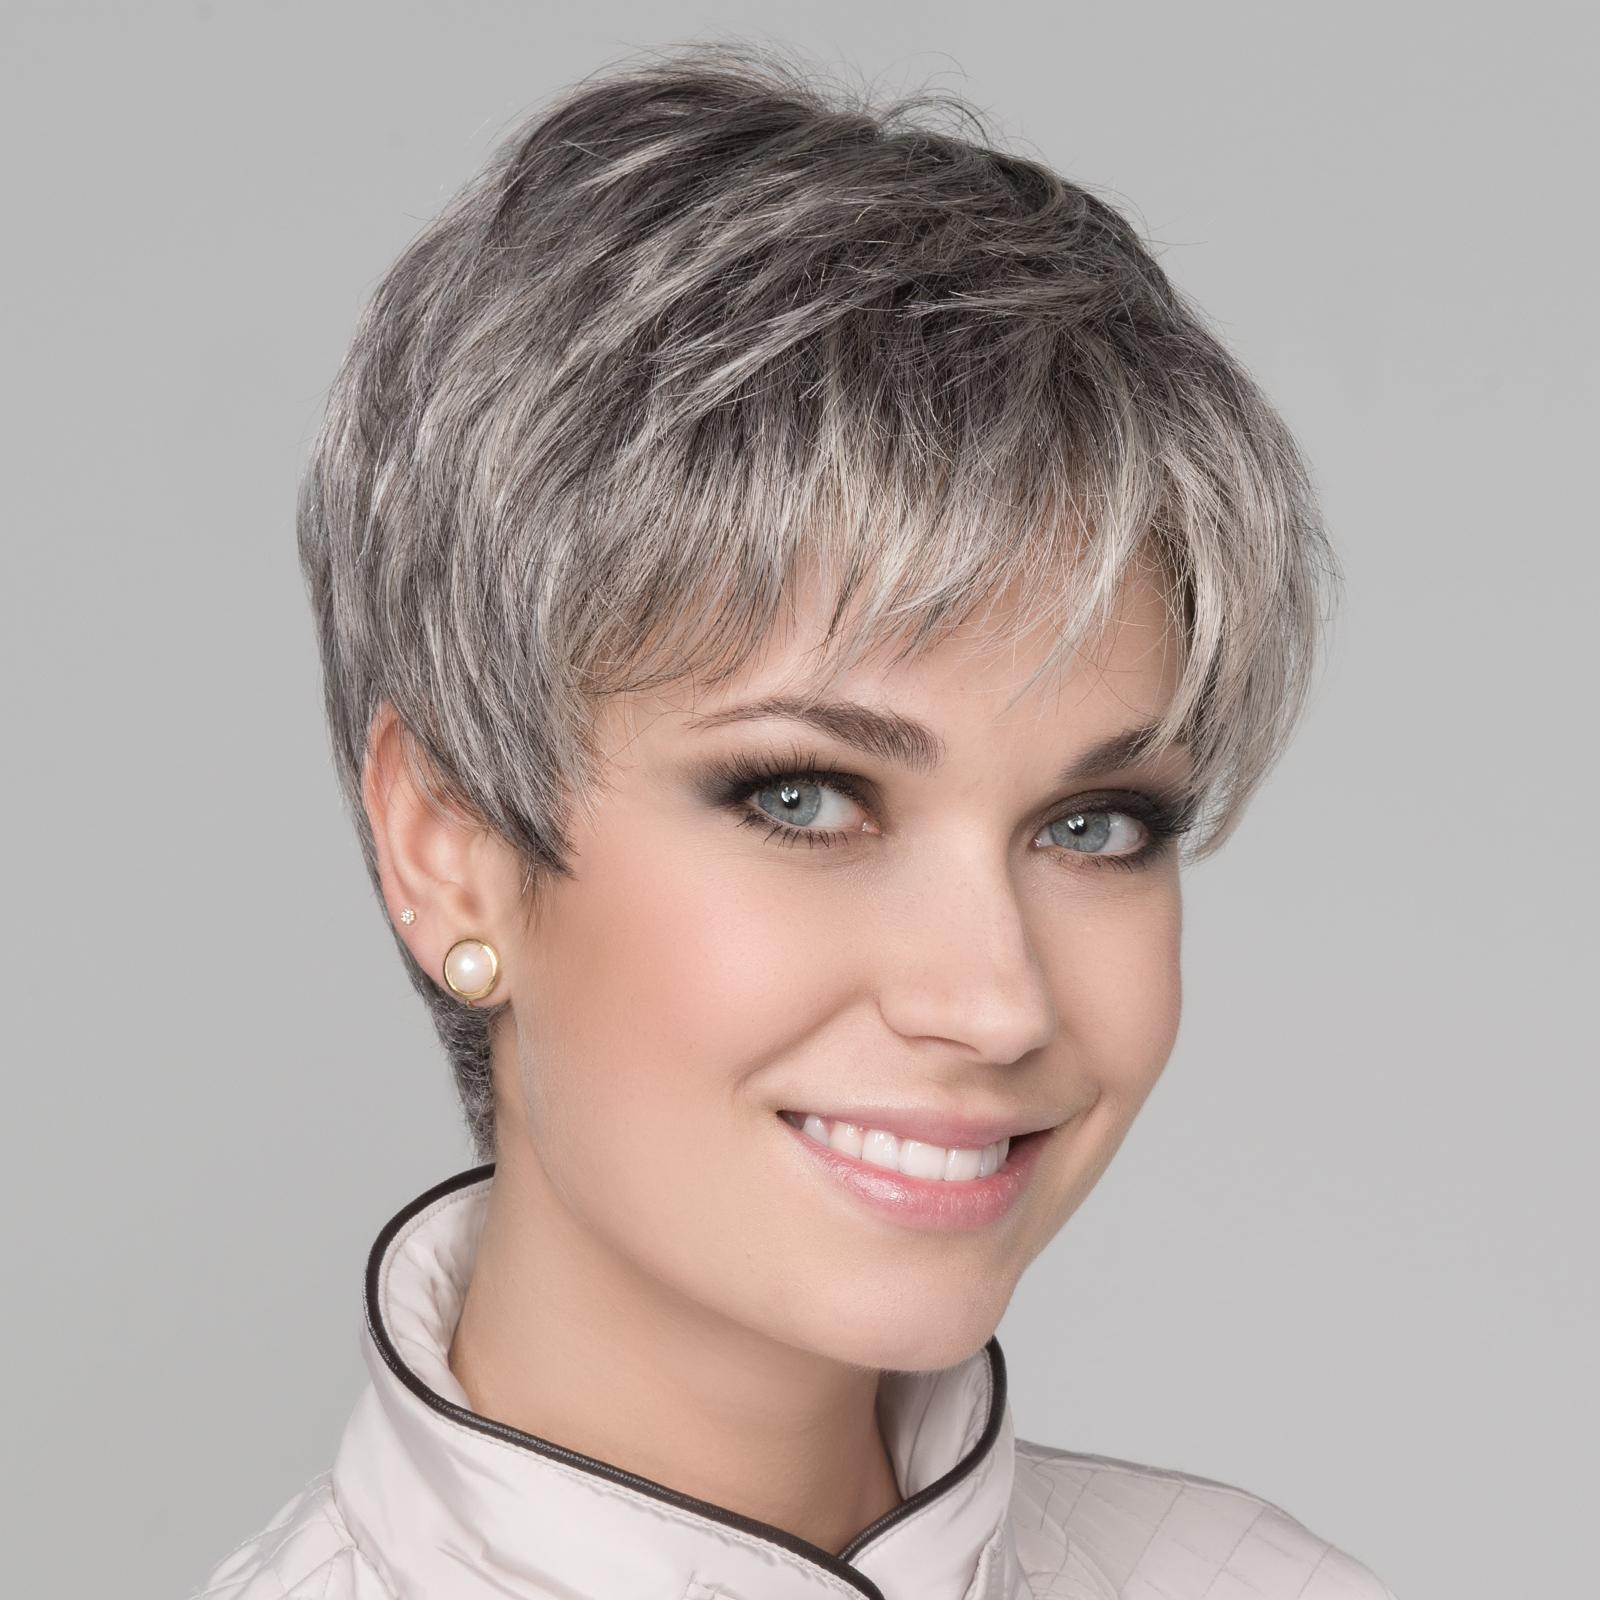 Lyhyet hiukset dating site